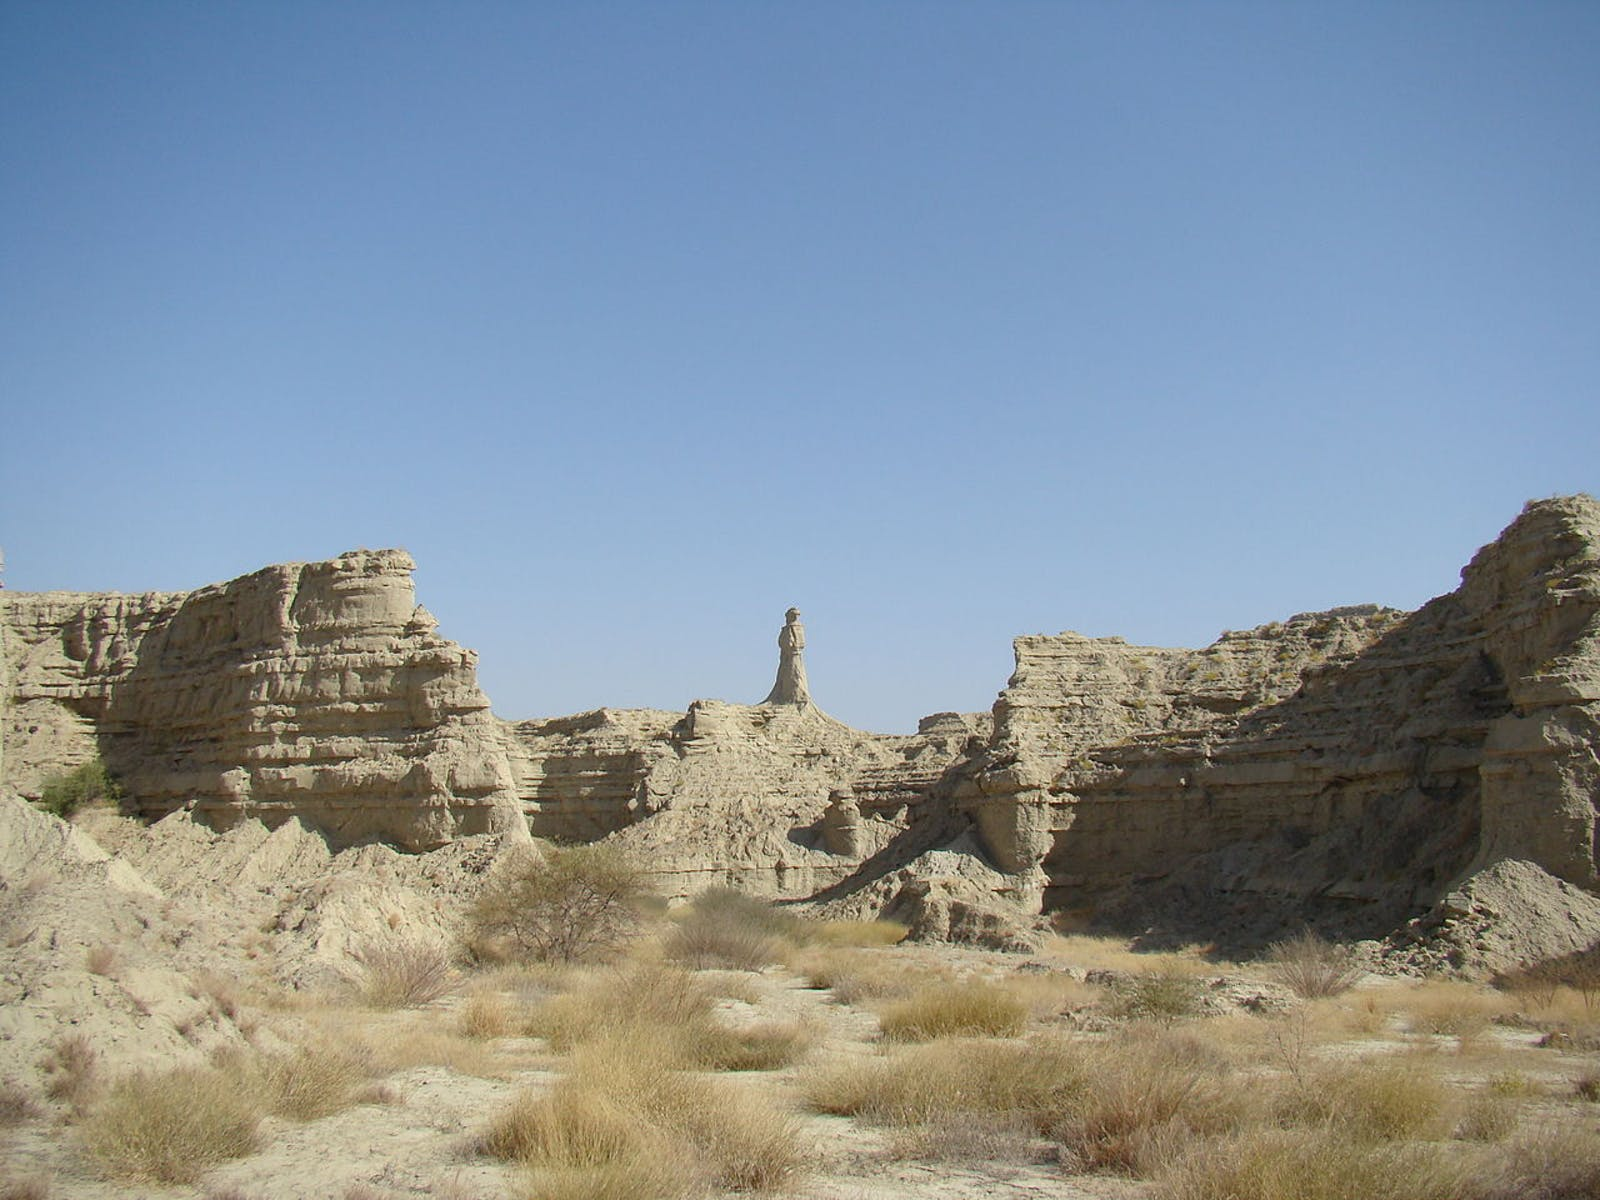 South Iran Nubo-Sindian Desert and Semi-Desert